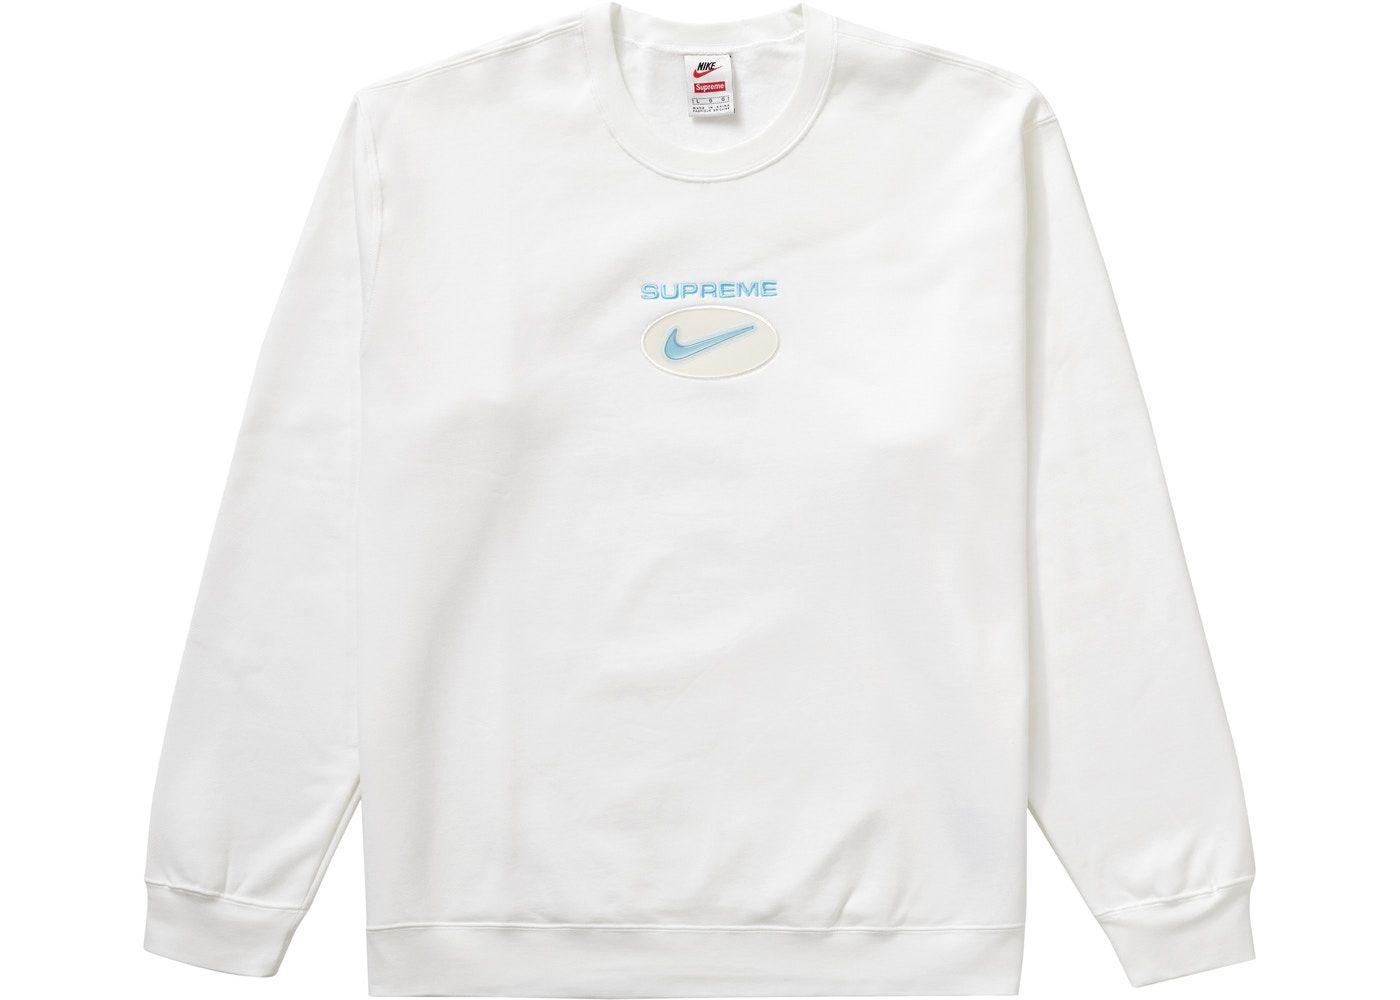 Supreme Nike Jewel Crewneck White In 2021 Supreme Clothing Supreme Logo Nike Crewneck [ 1000 x 1400 Pixel ]